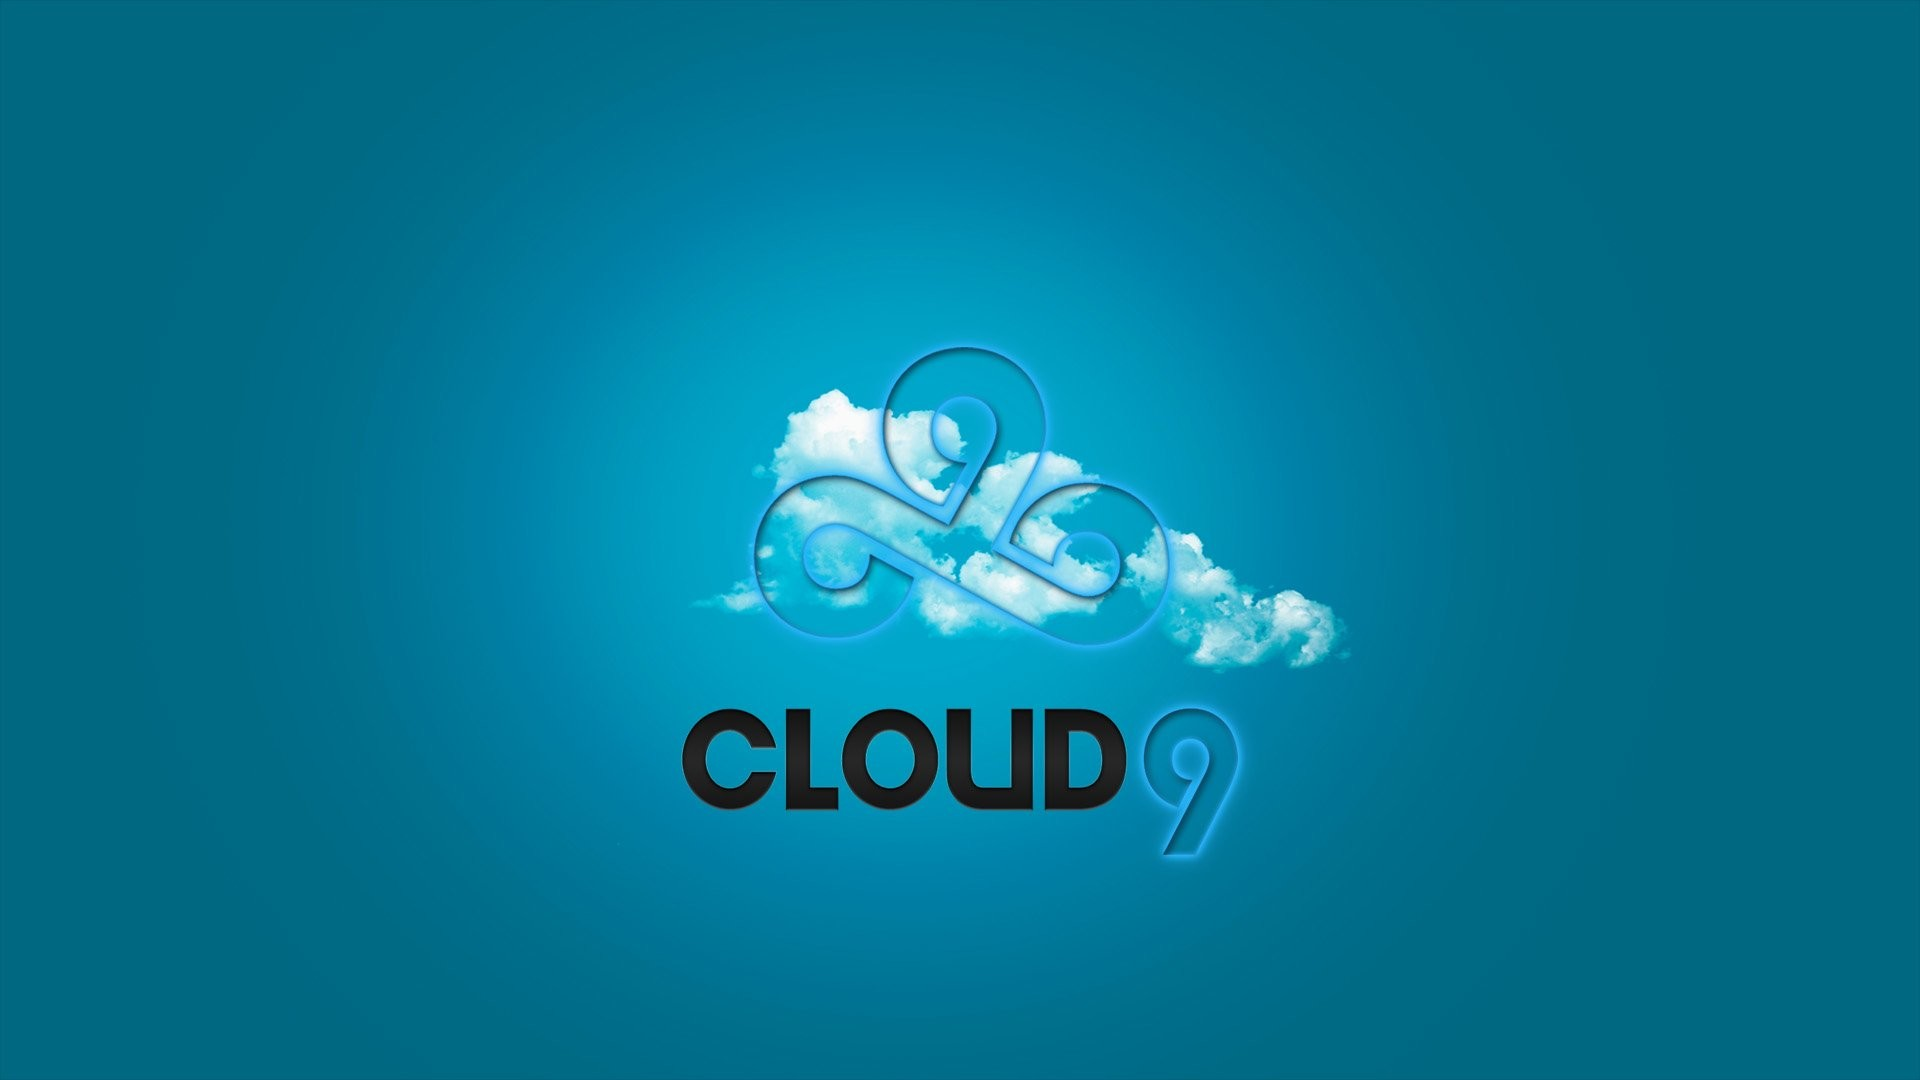 Cloud9 · HD Wallpaper | Background ID:542026